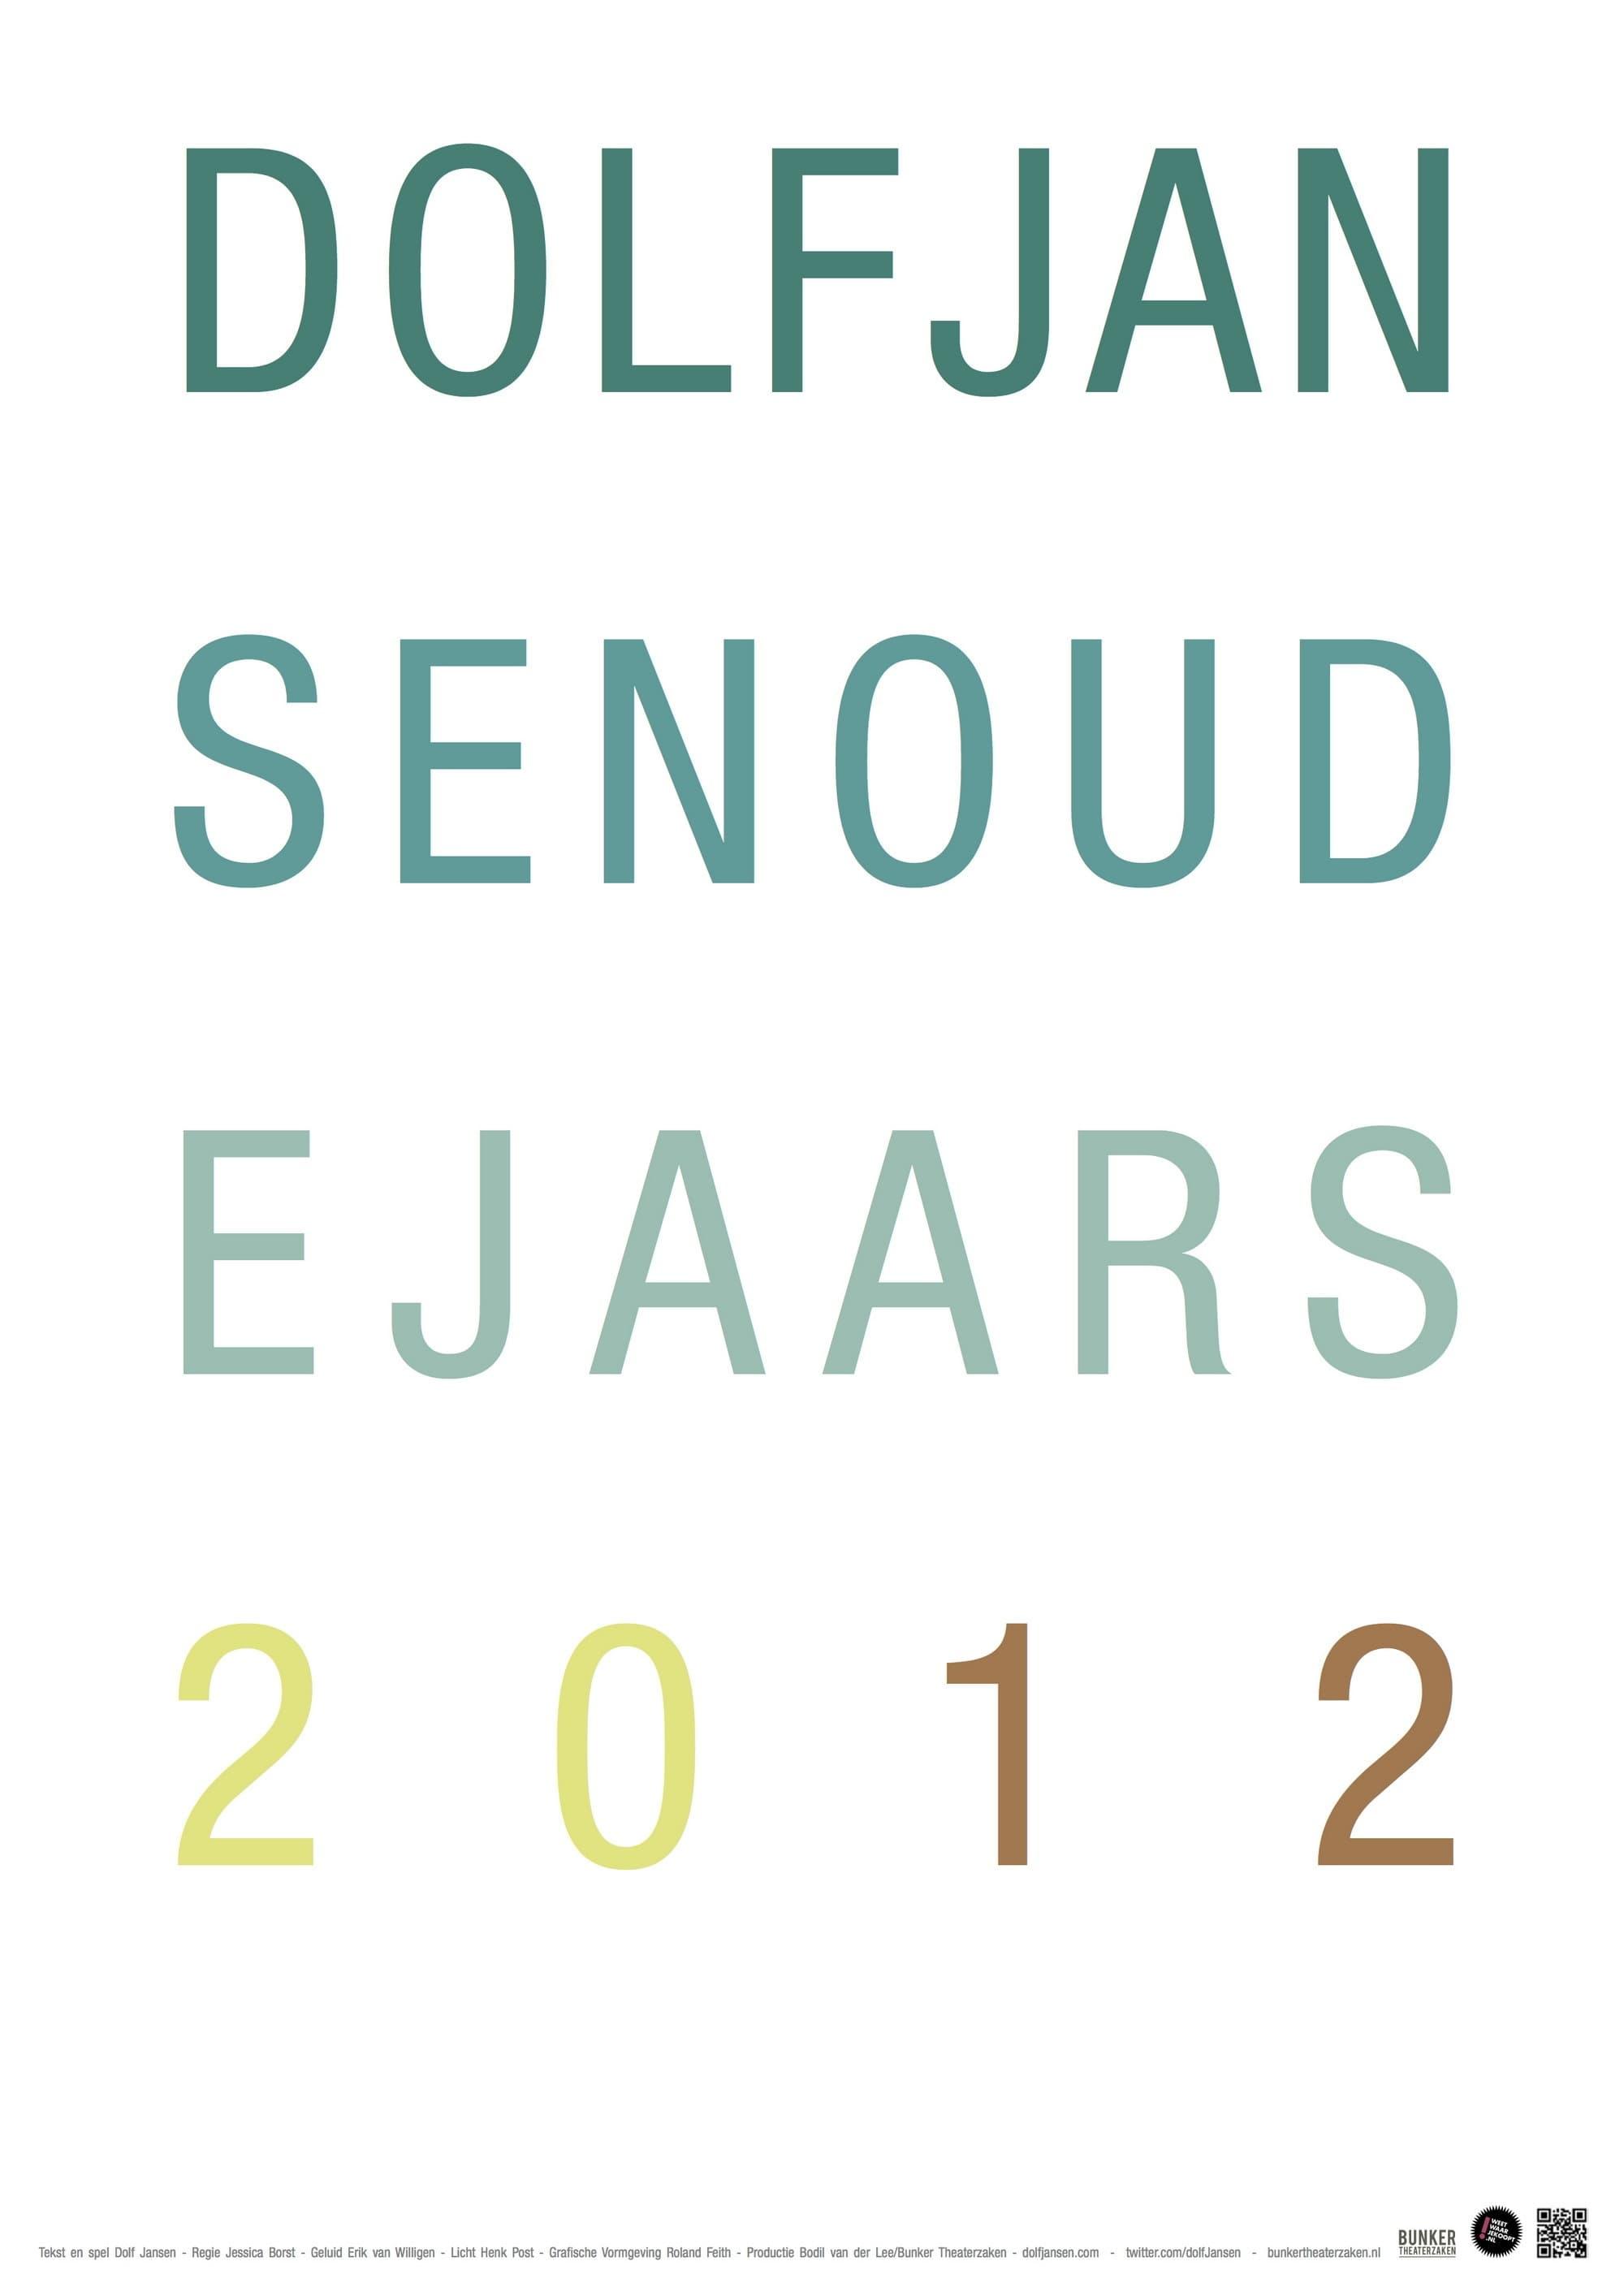 Dolf Jansen: Oudejaars 2012